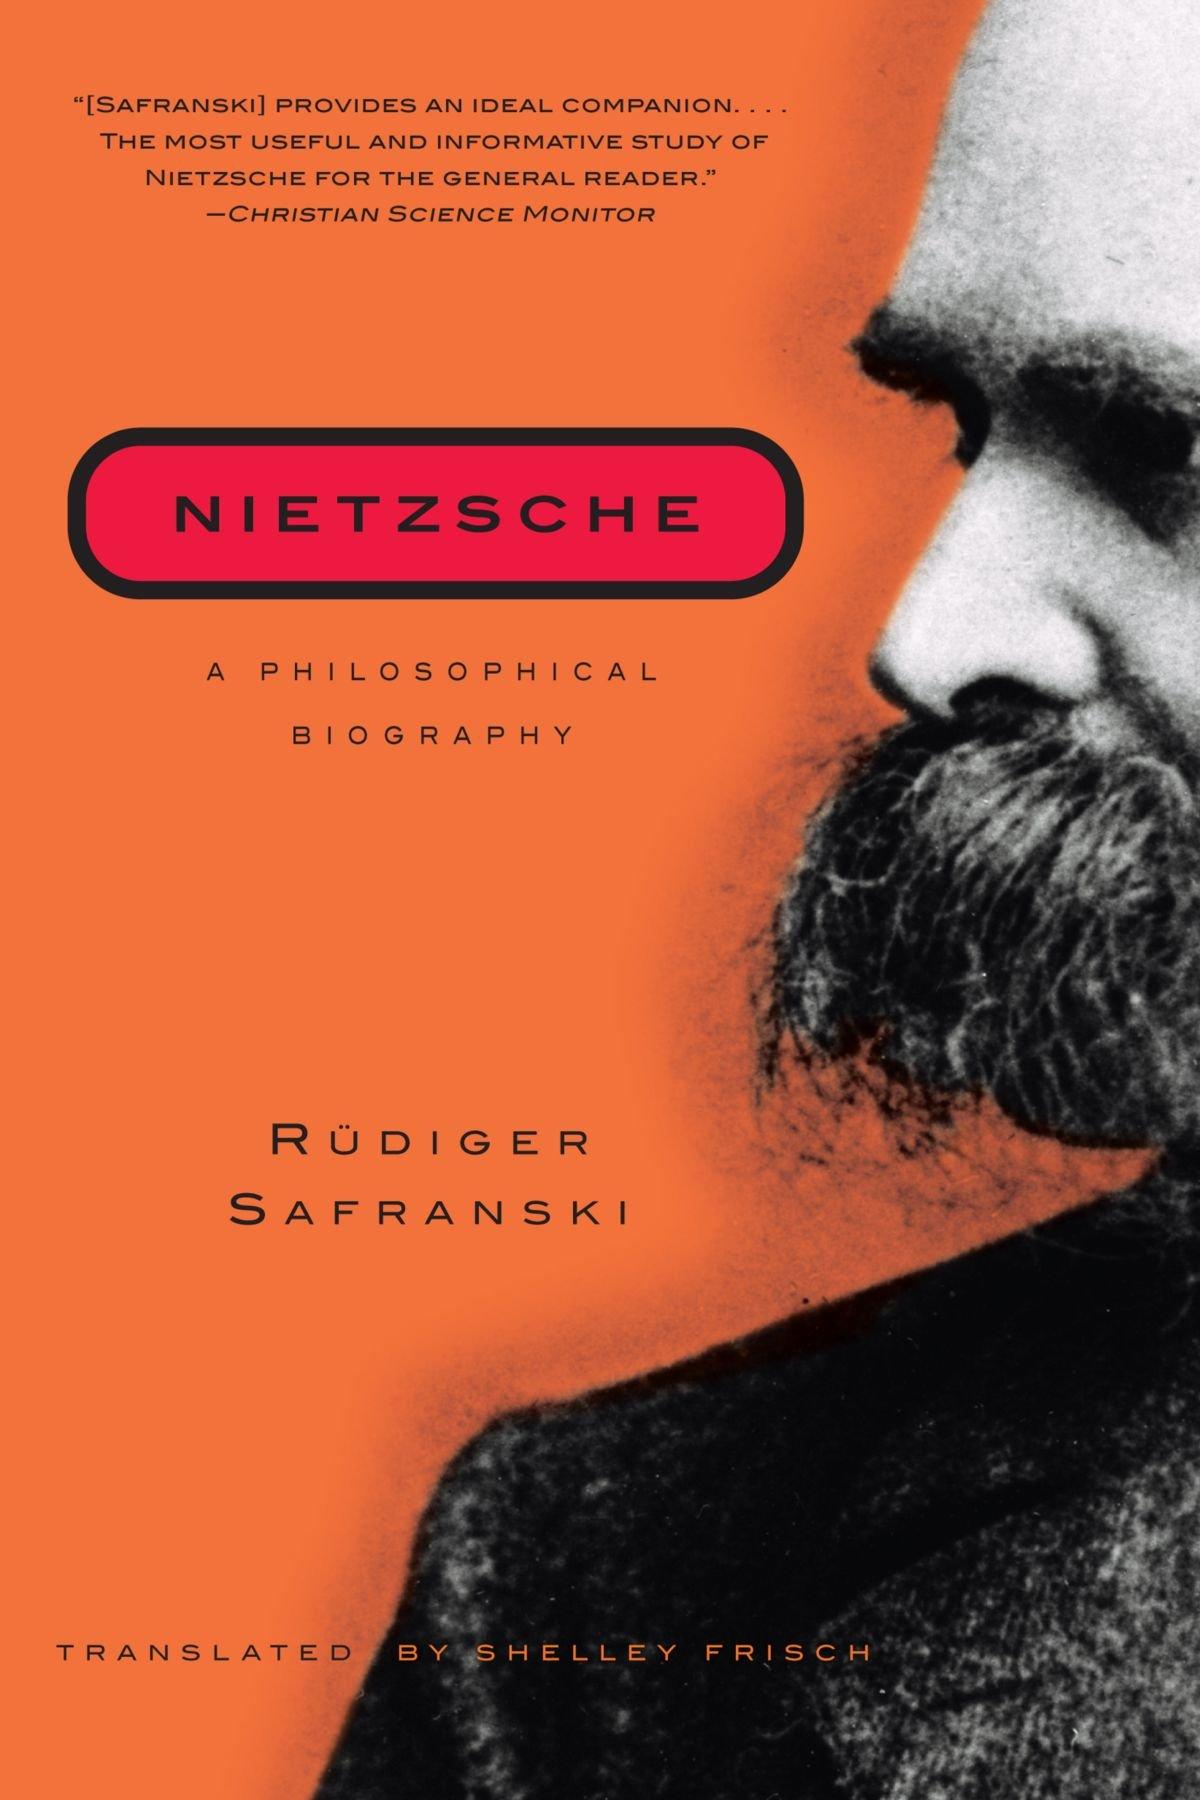 Tell the basics of Nietzsches philosophy